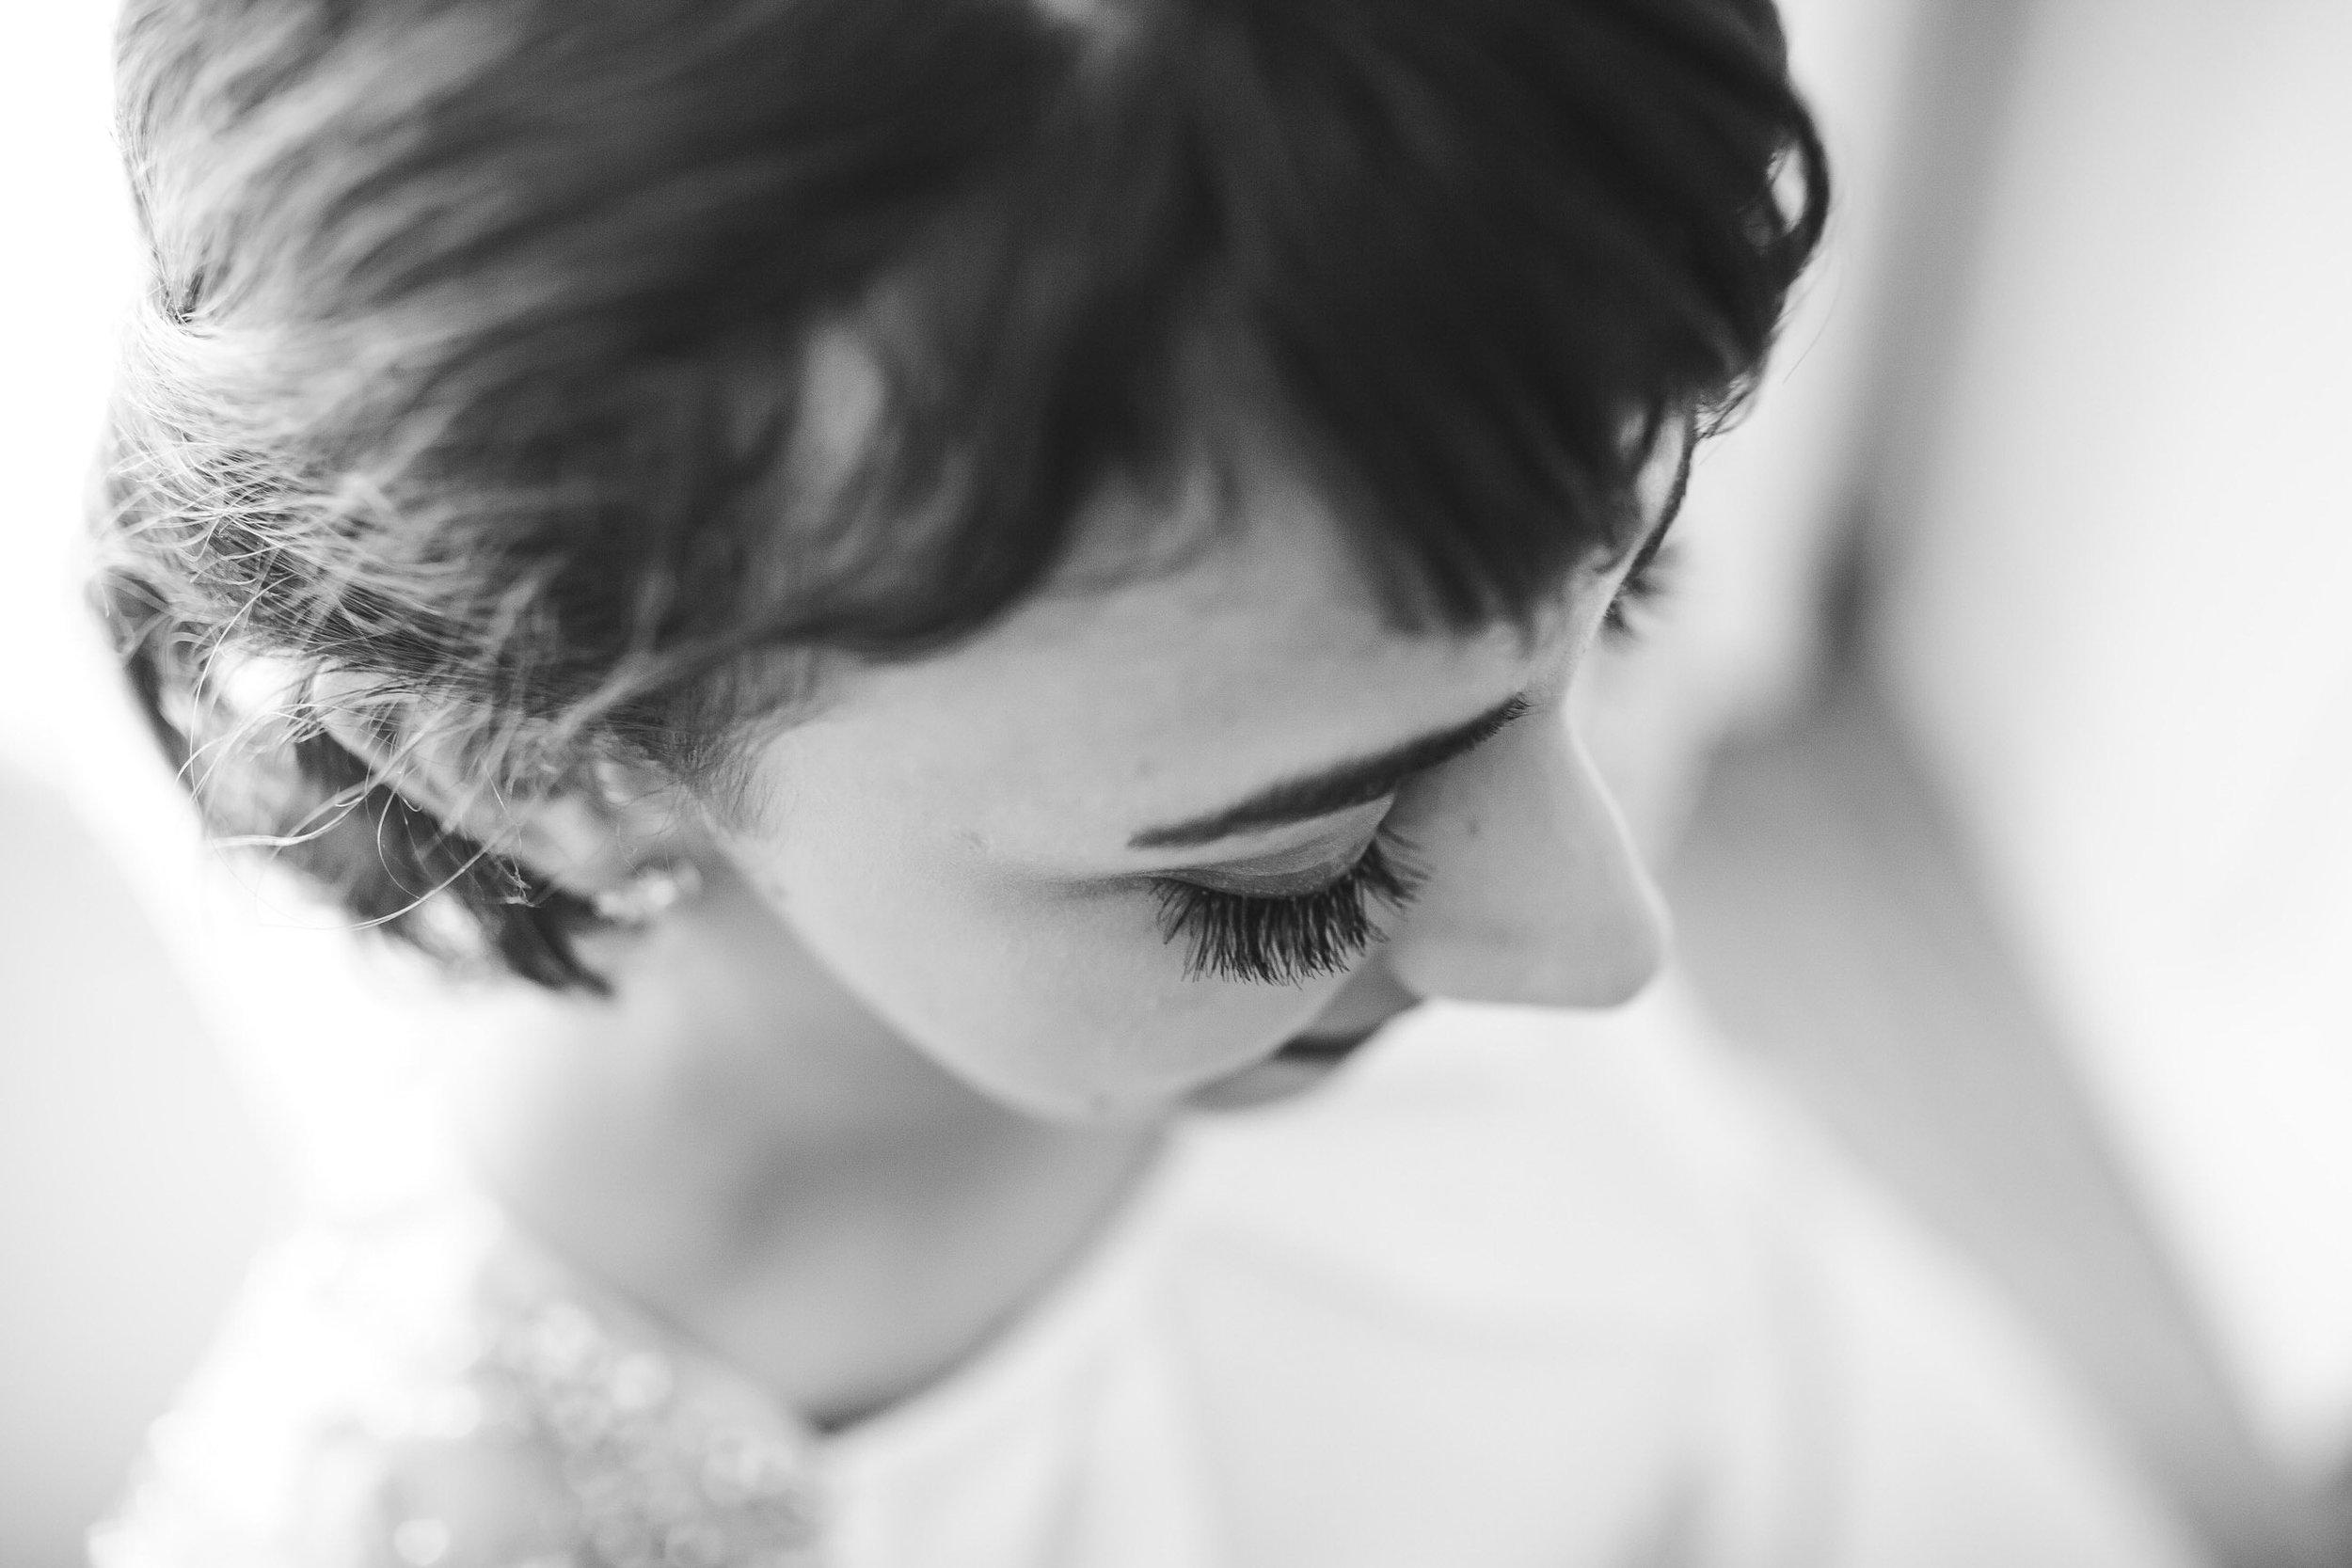 bride-getting-ready-details-fort-lauderdale-wedding-photographer-117.jpg